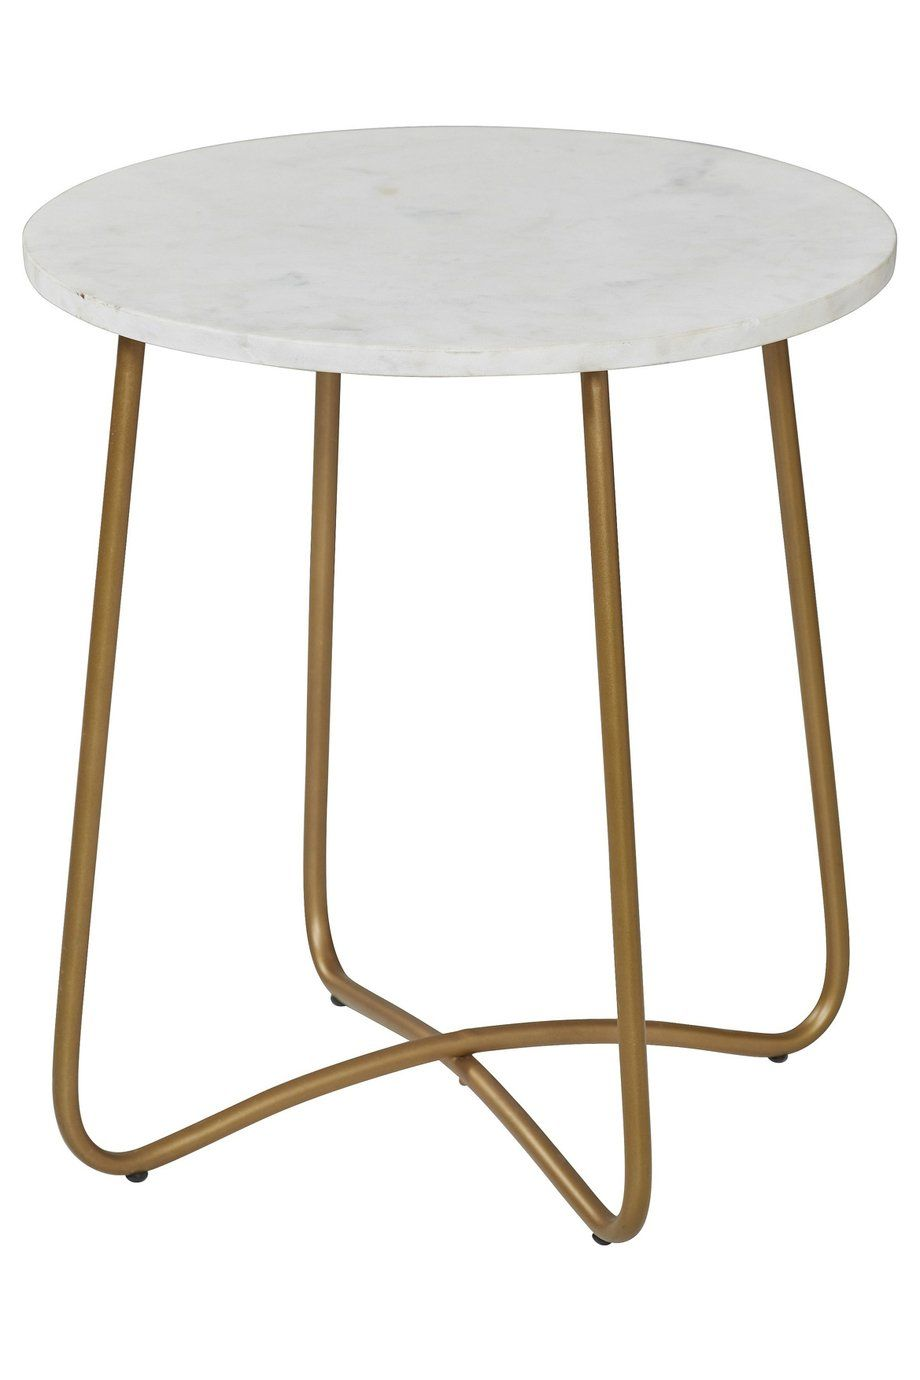 Jessica Astor Marble Table White Gold Interior Secrets